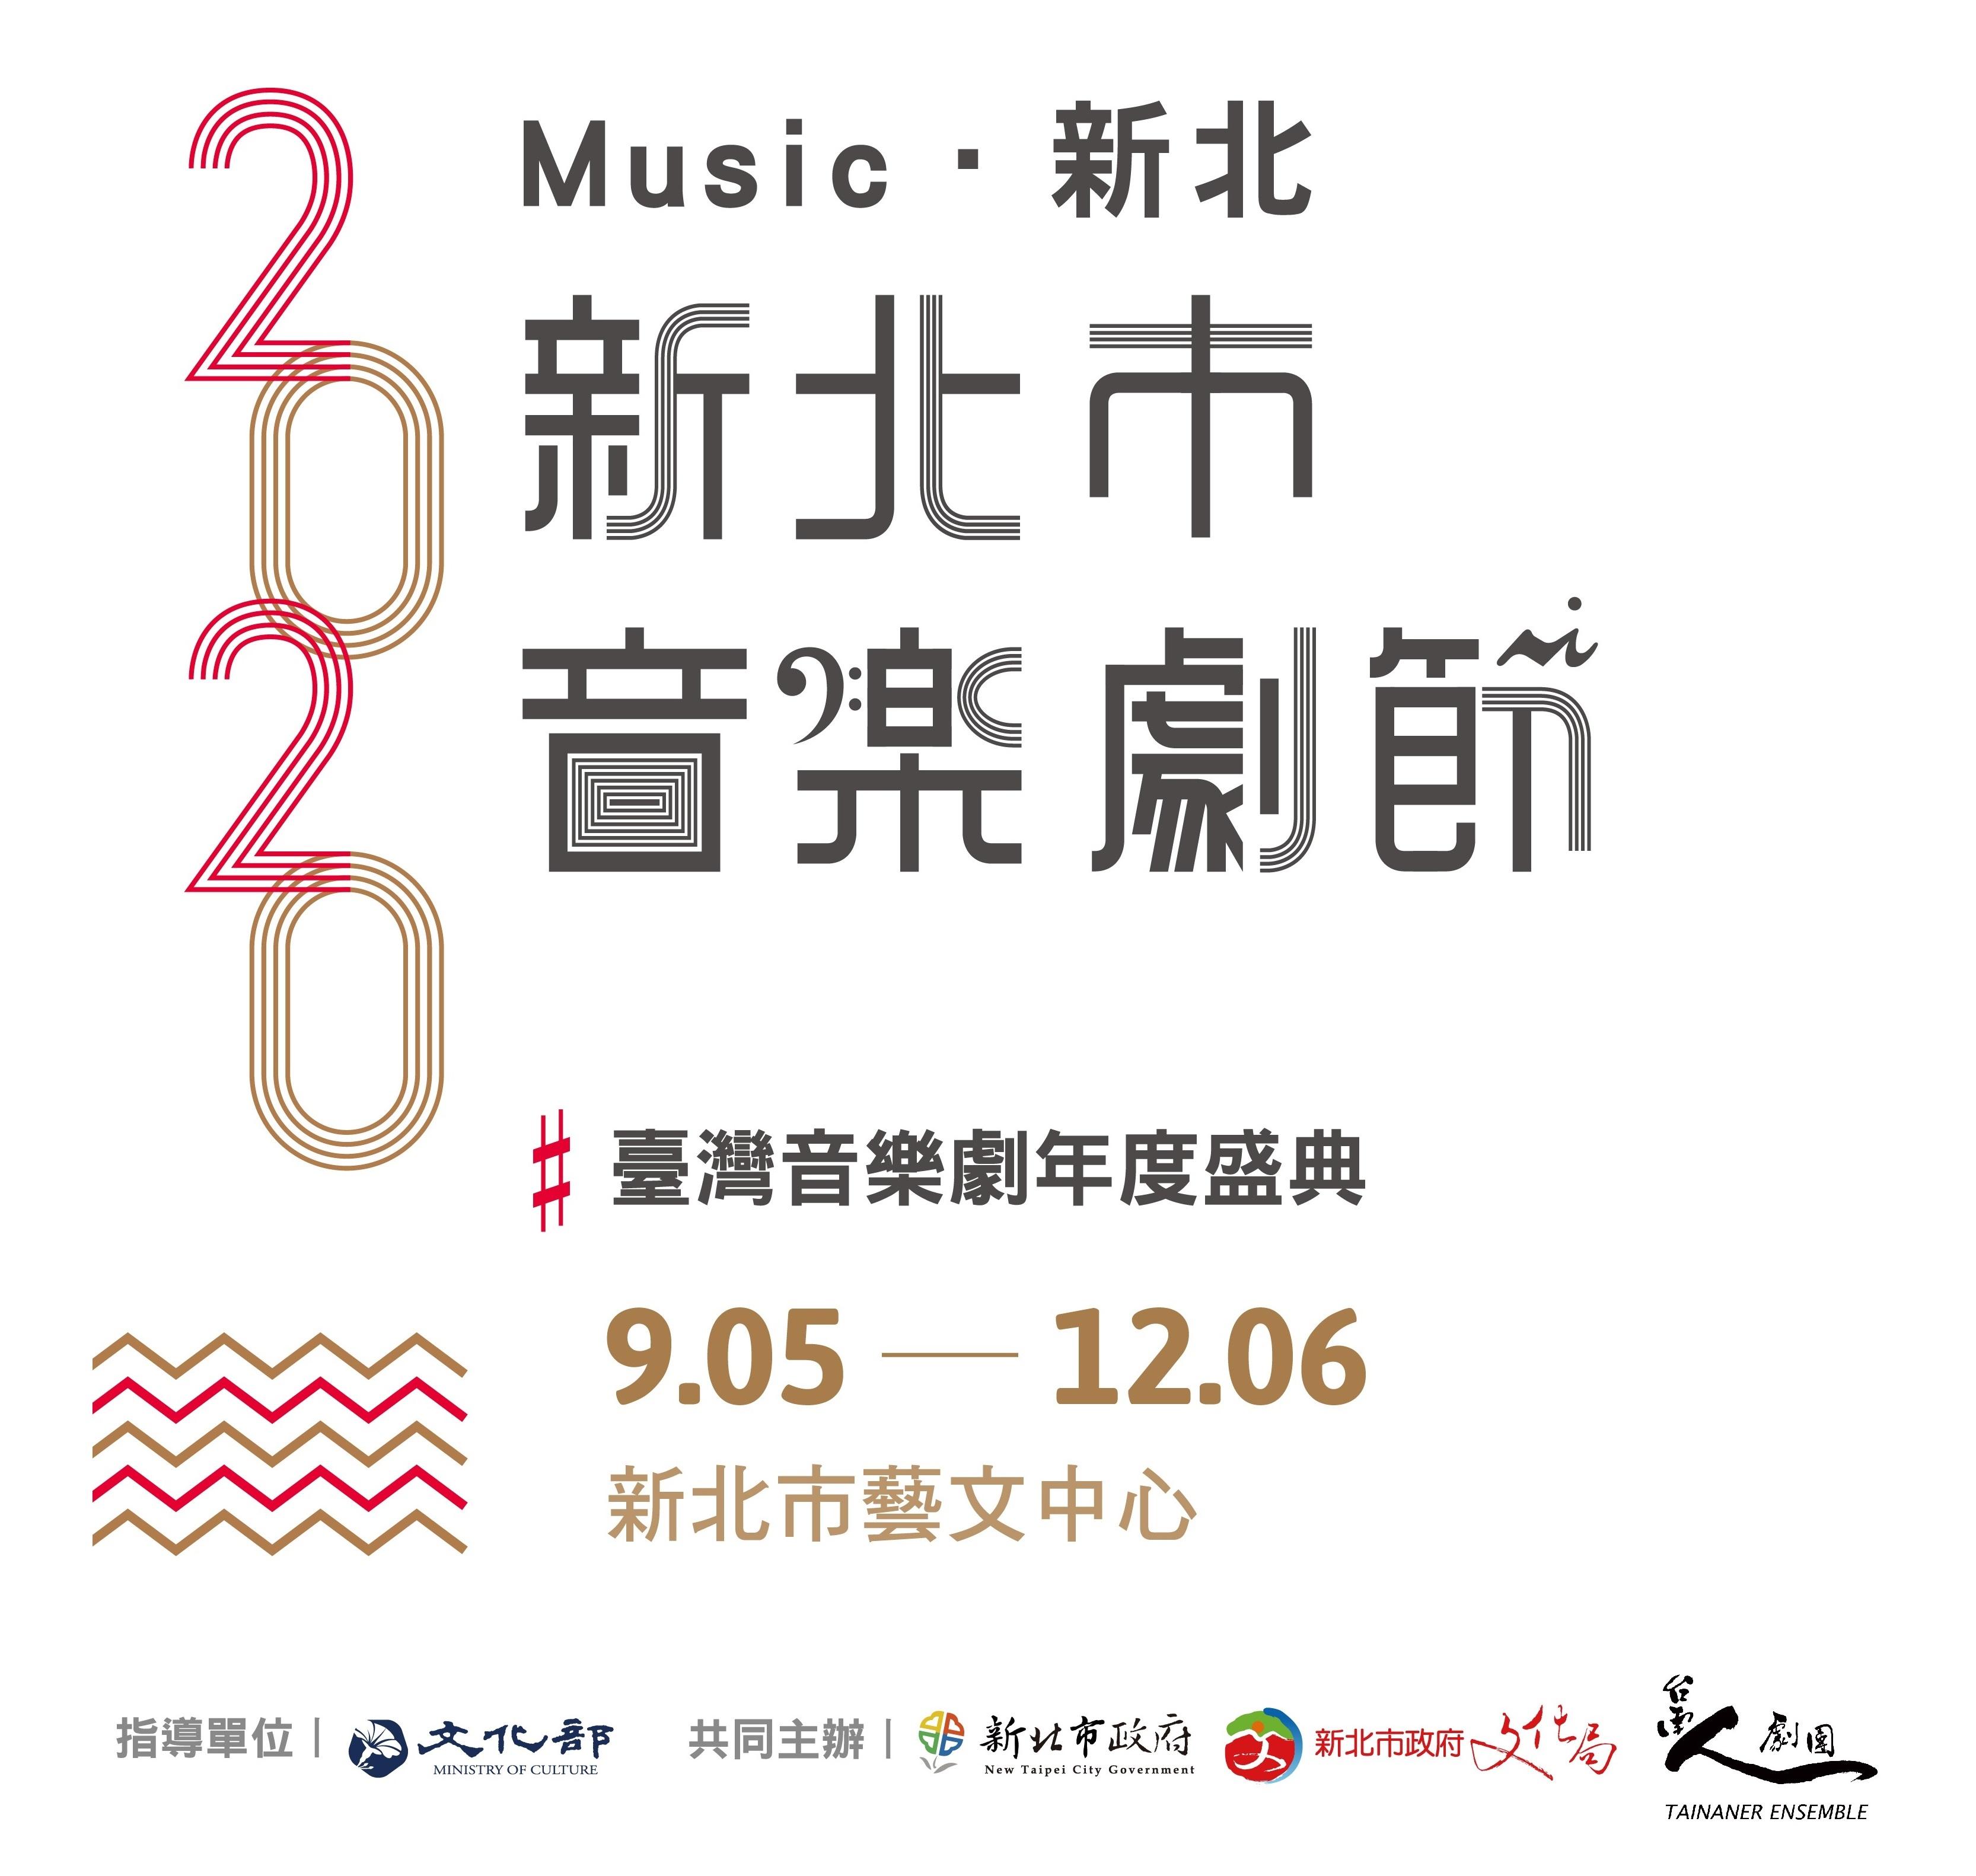 「Music.新北─2020新北市音樂劇節」